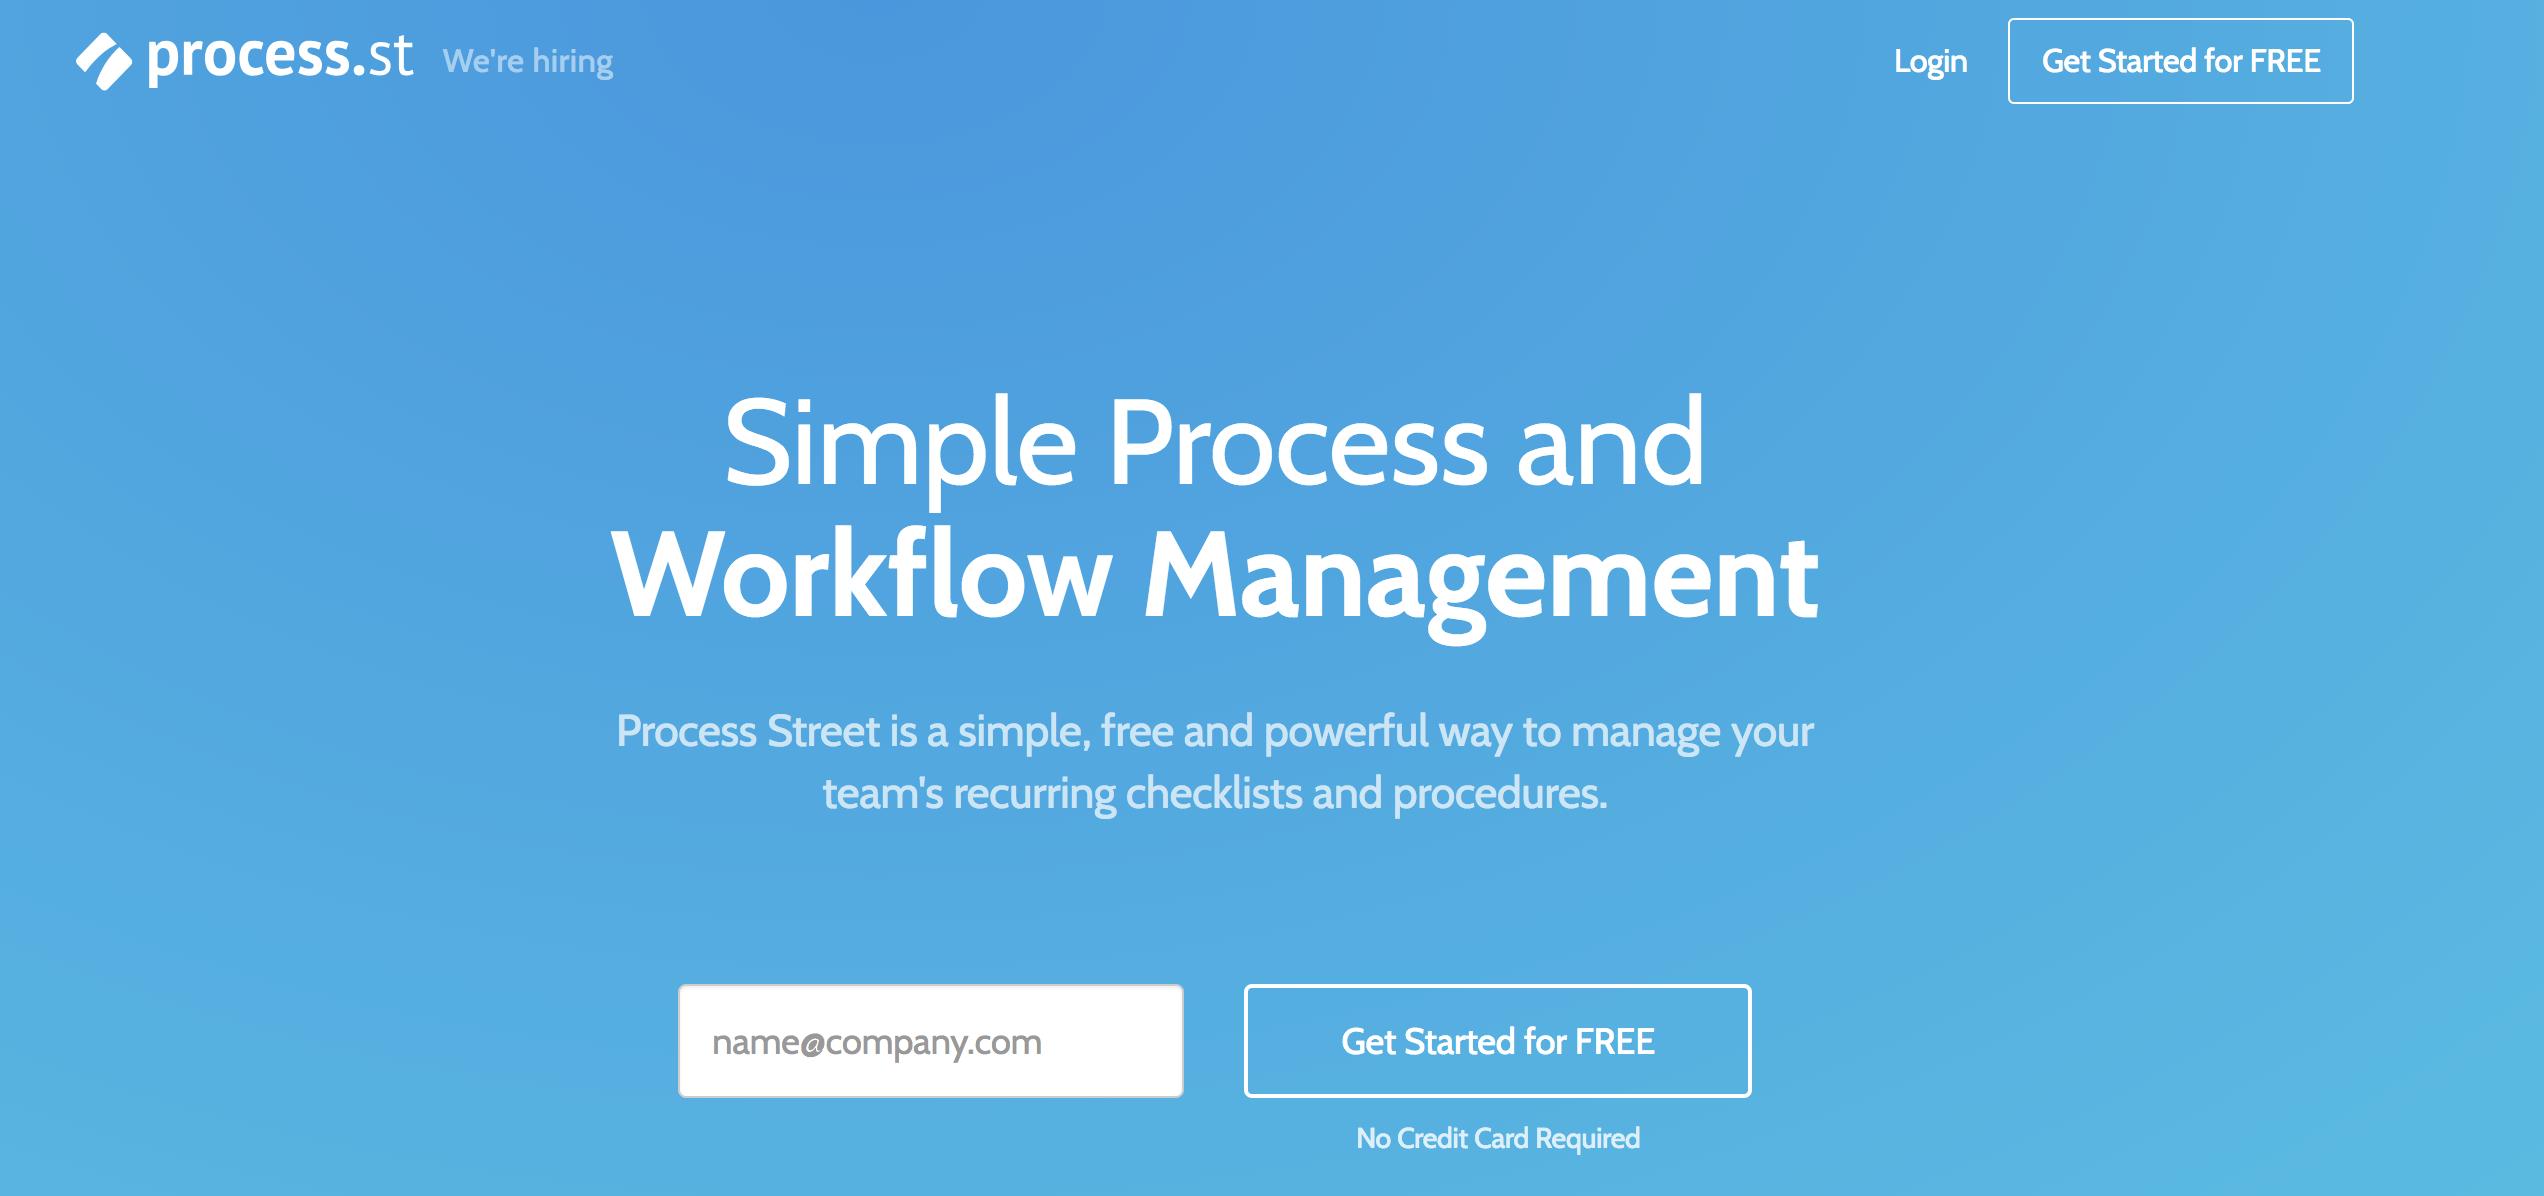 Process Street daily checklist app